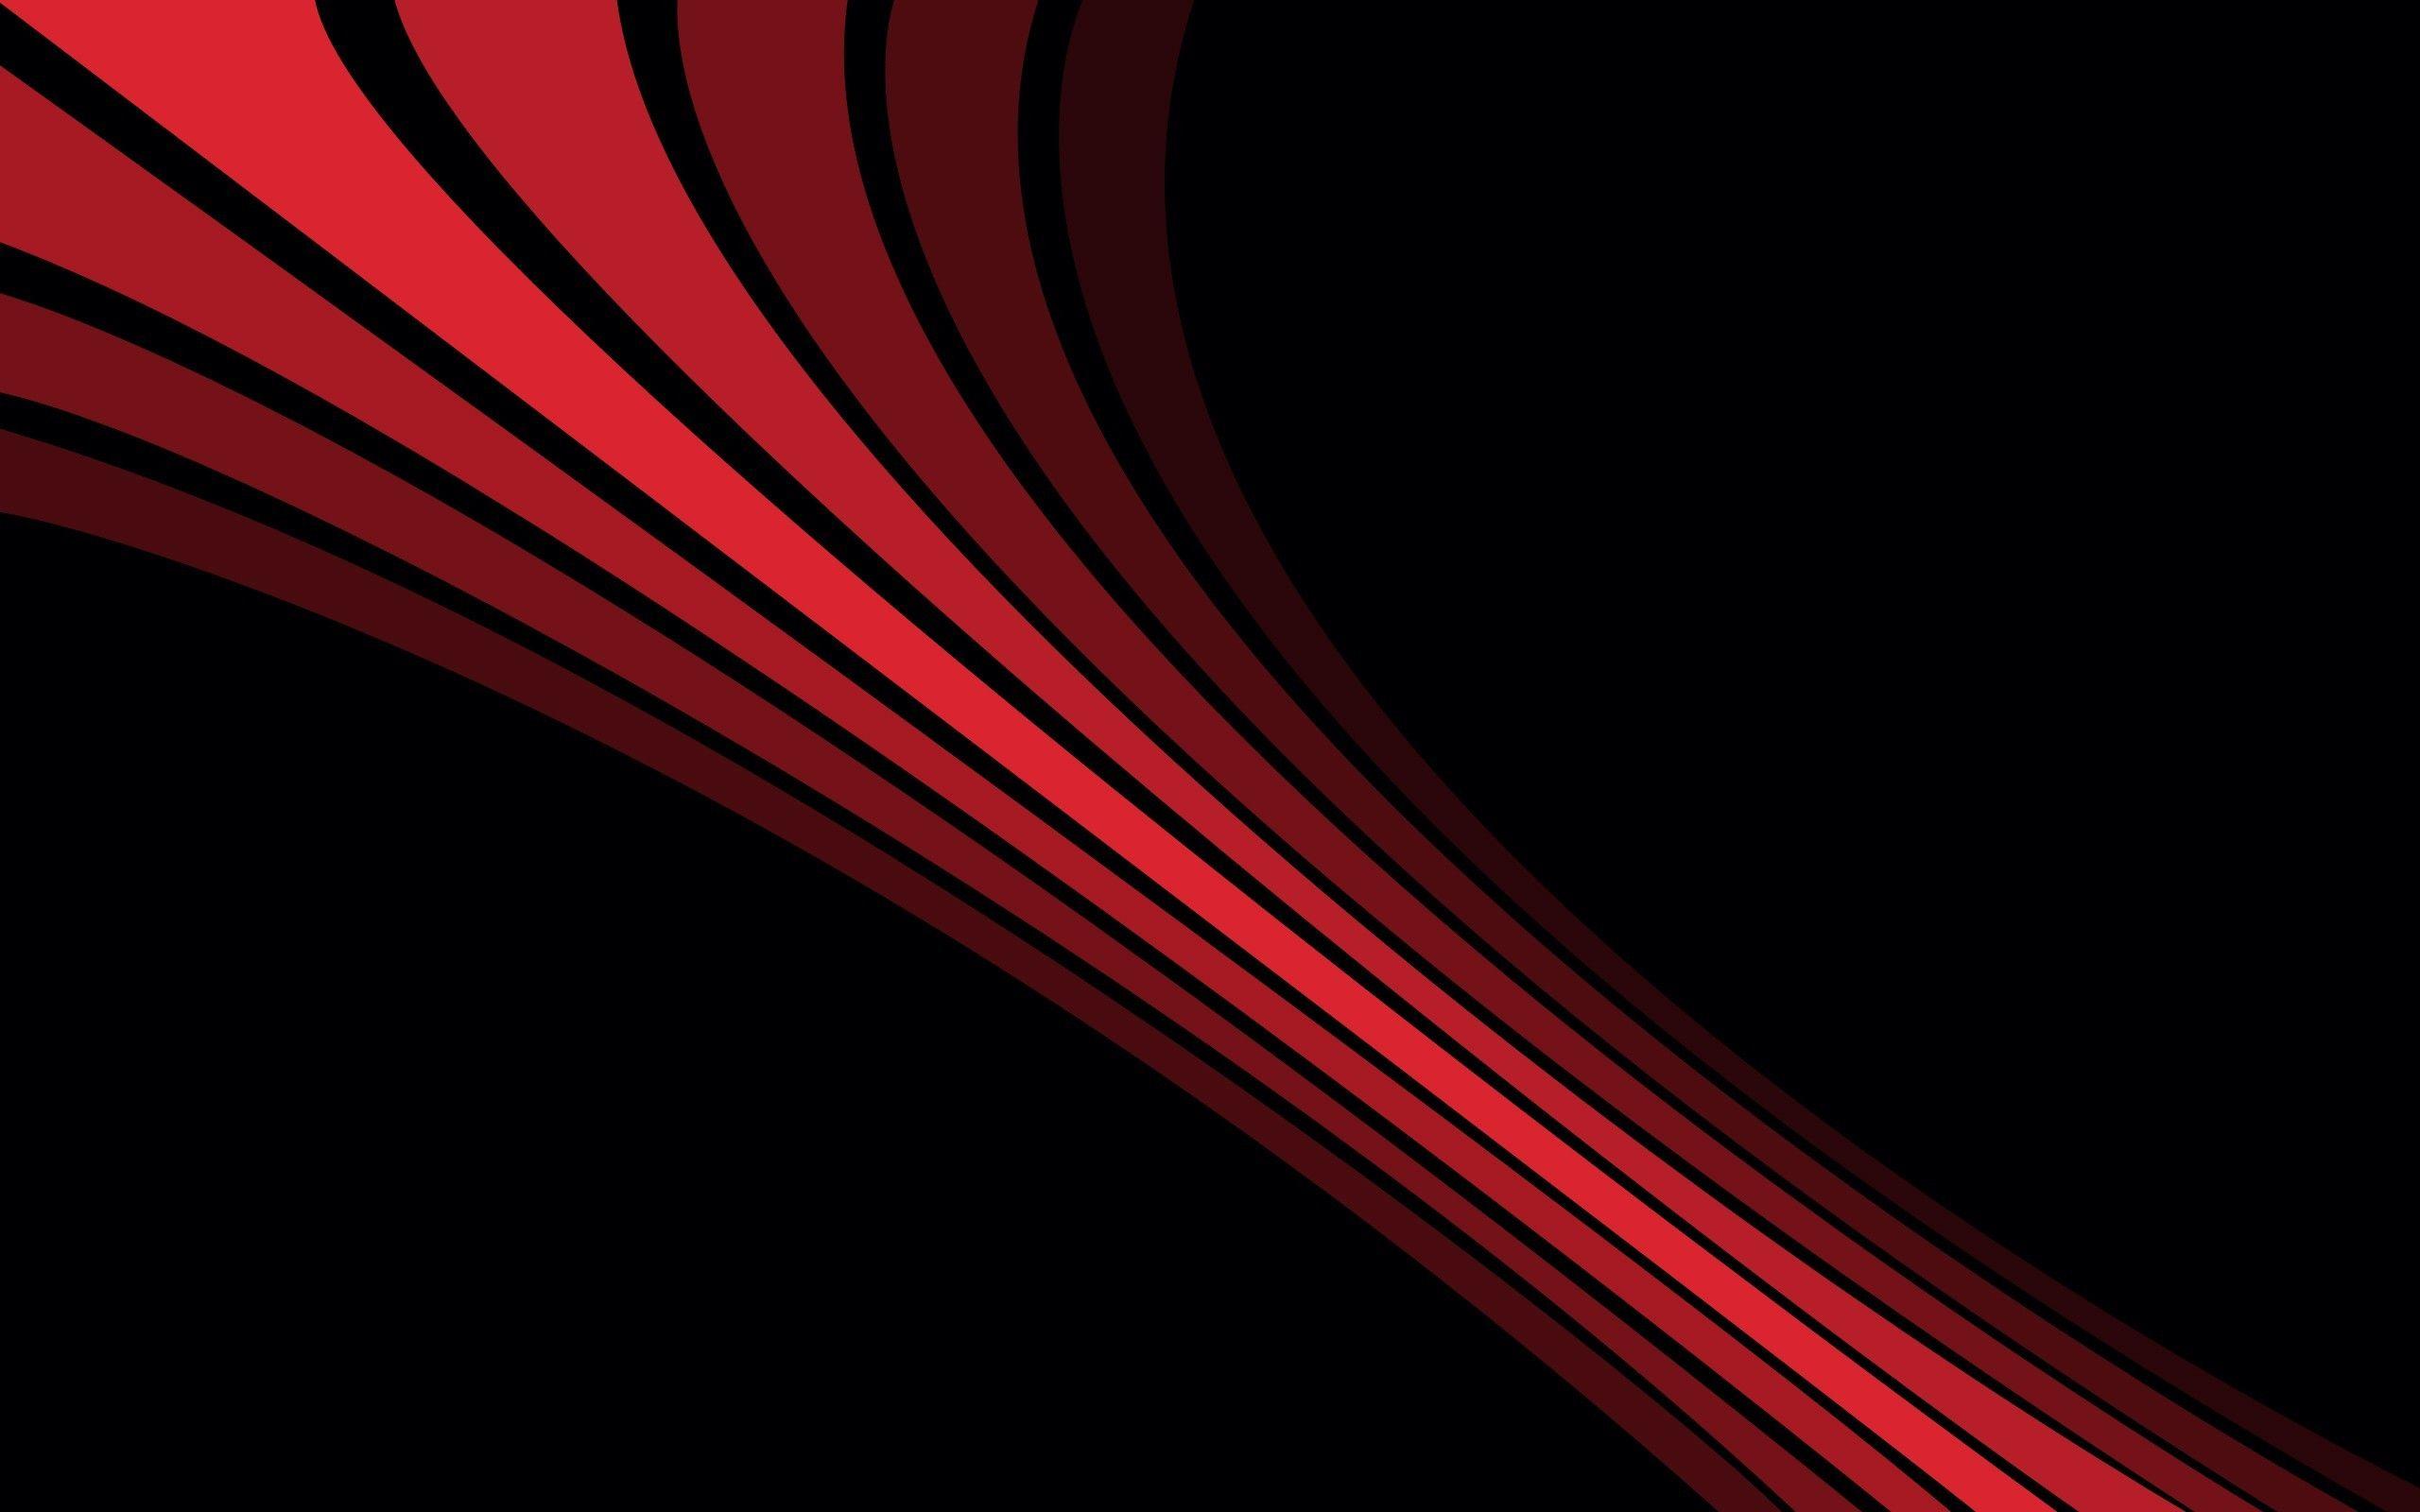 General 2560x1600 black background digital art simple red lines minimalism